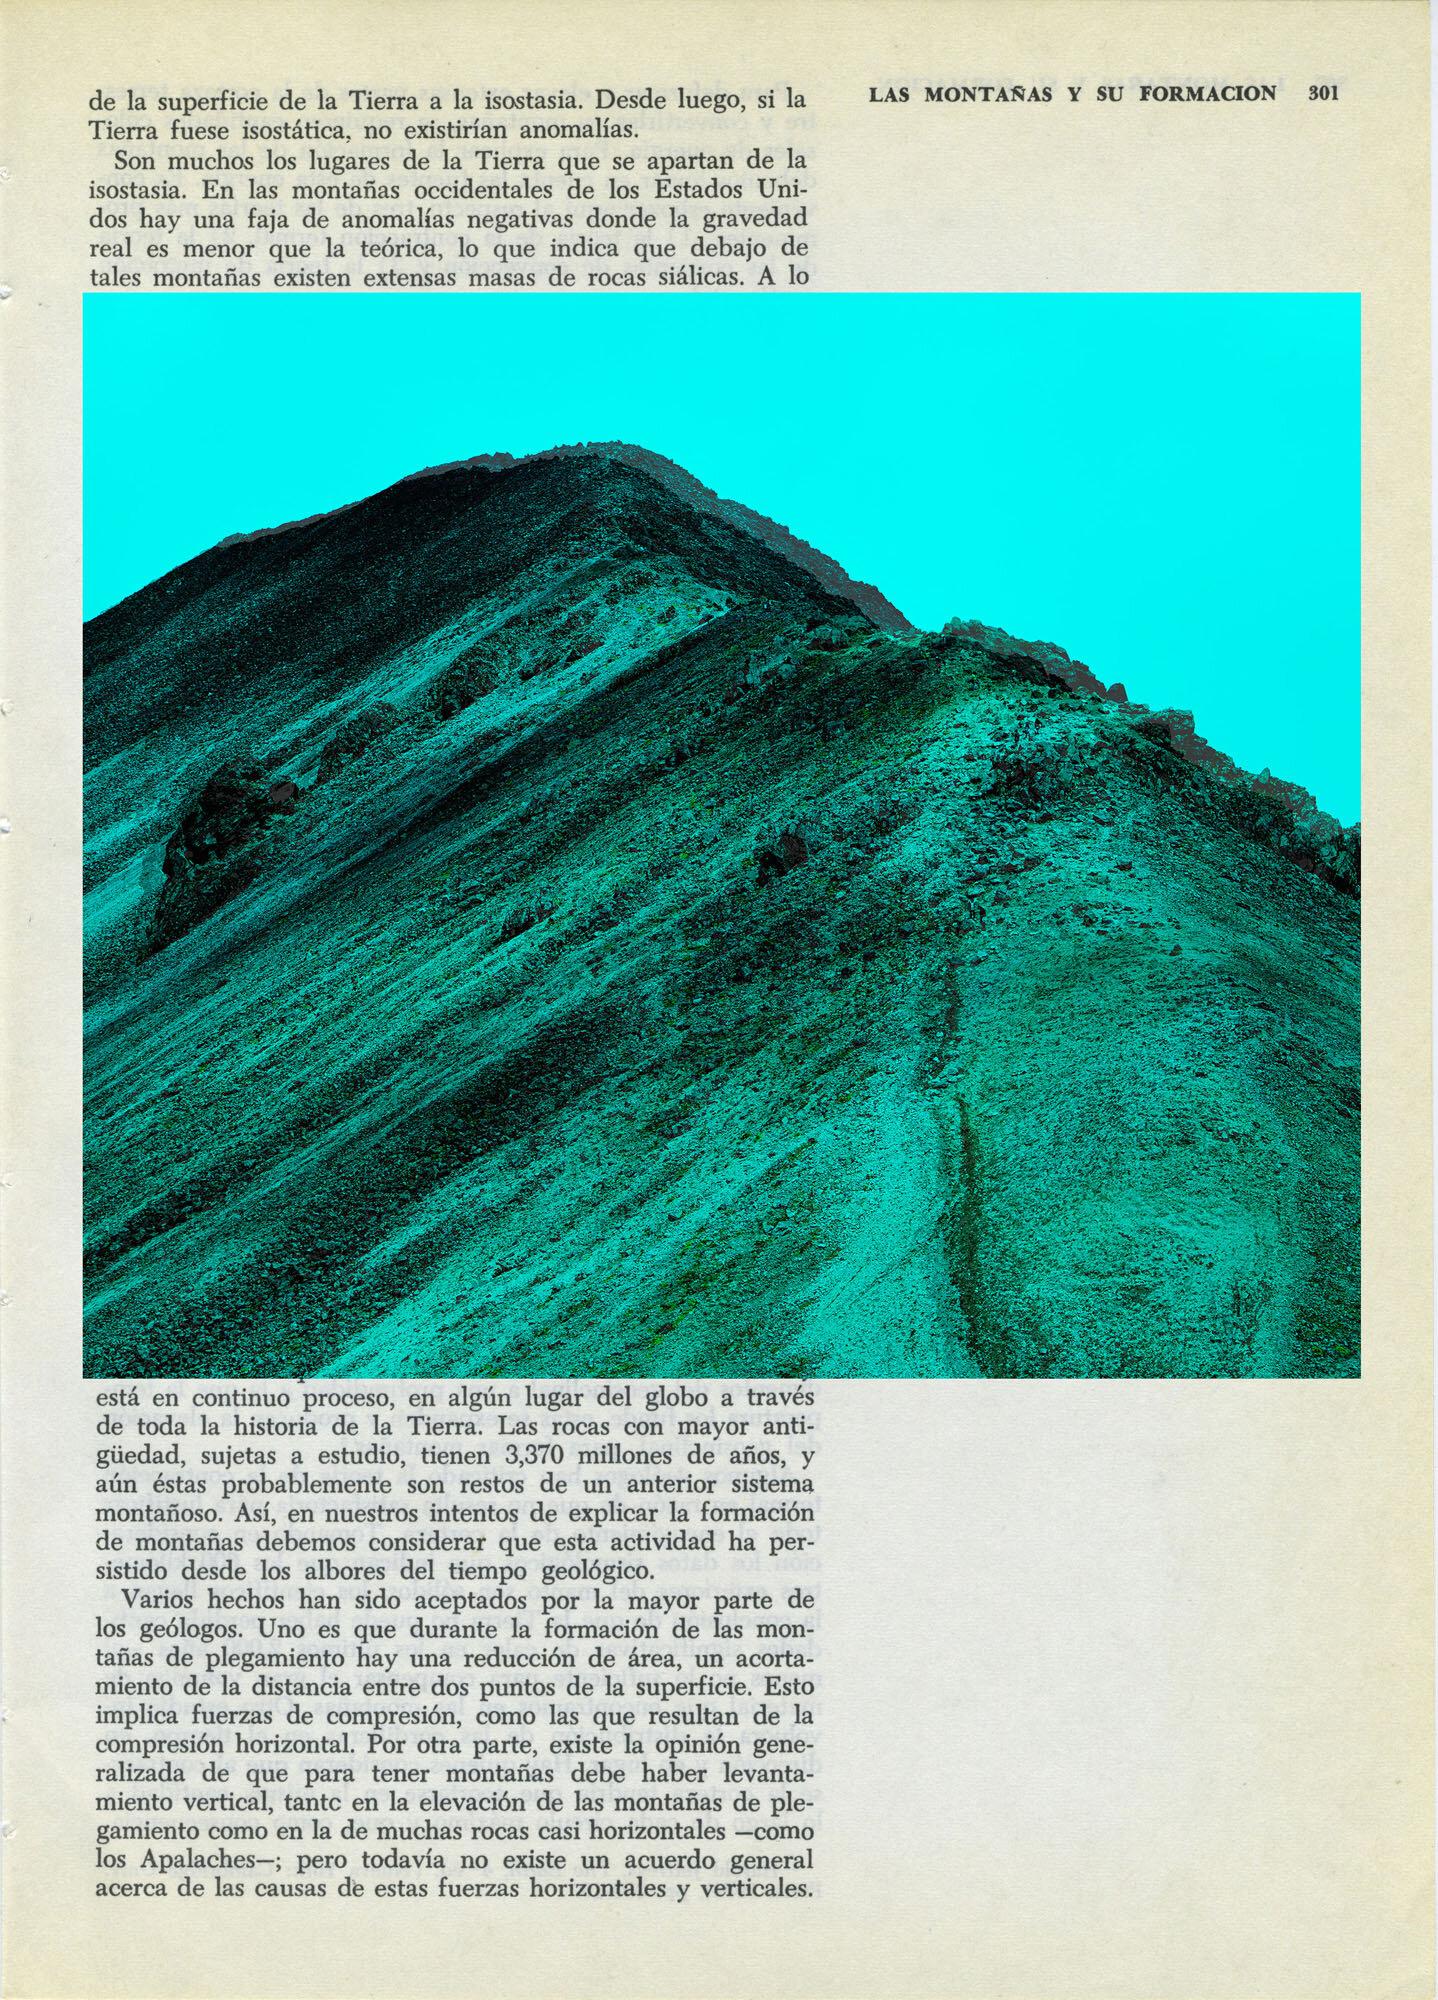 190205 NoA MountainFormation 9.jpg